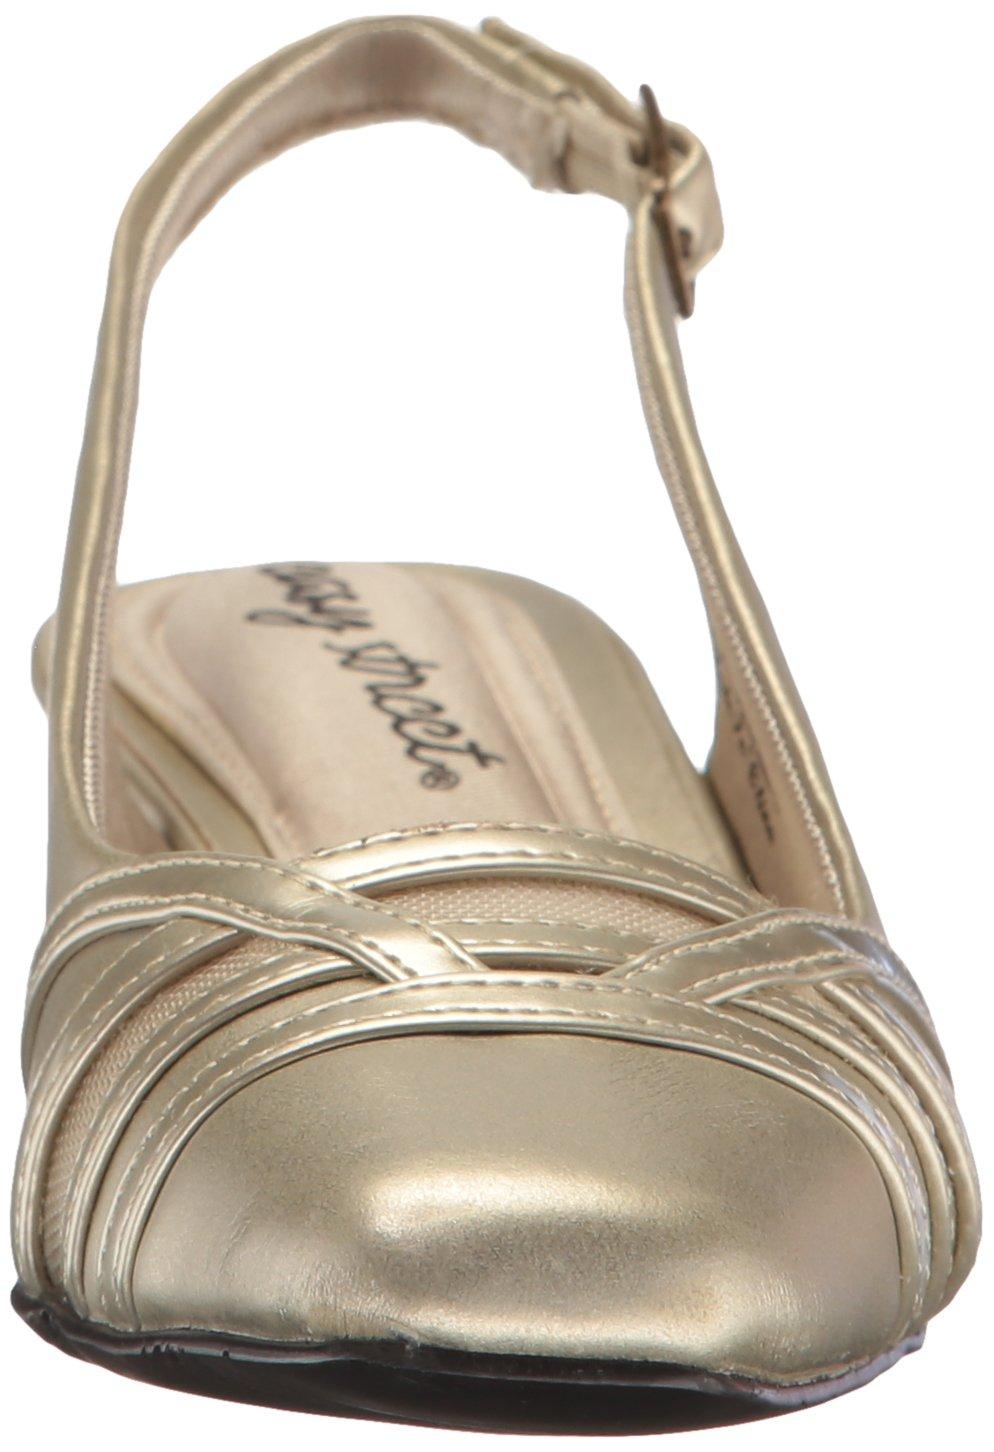 Easy Street Women's Kristen Dress Pump B01MXRP5HF 12 B(M) US|Champagne/Patent